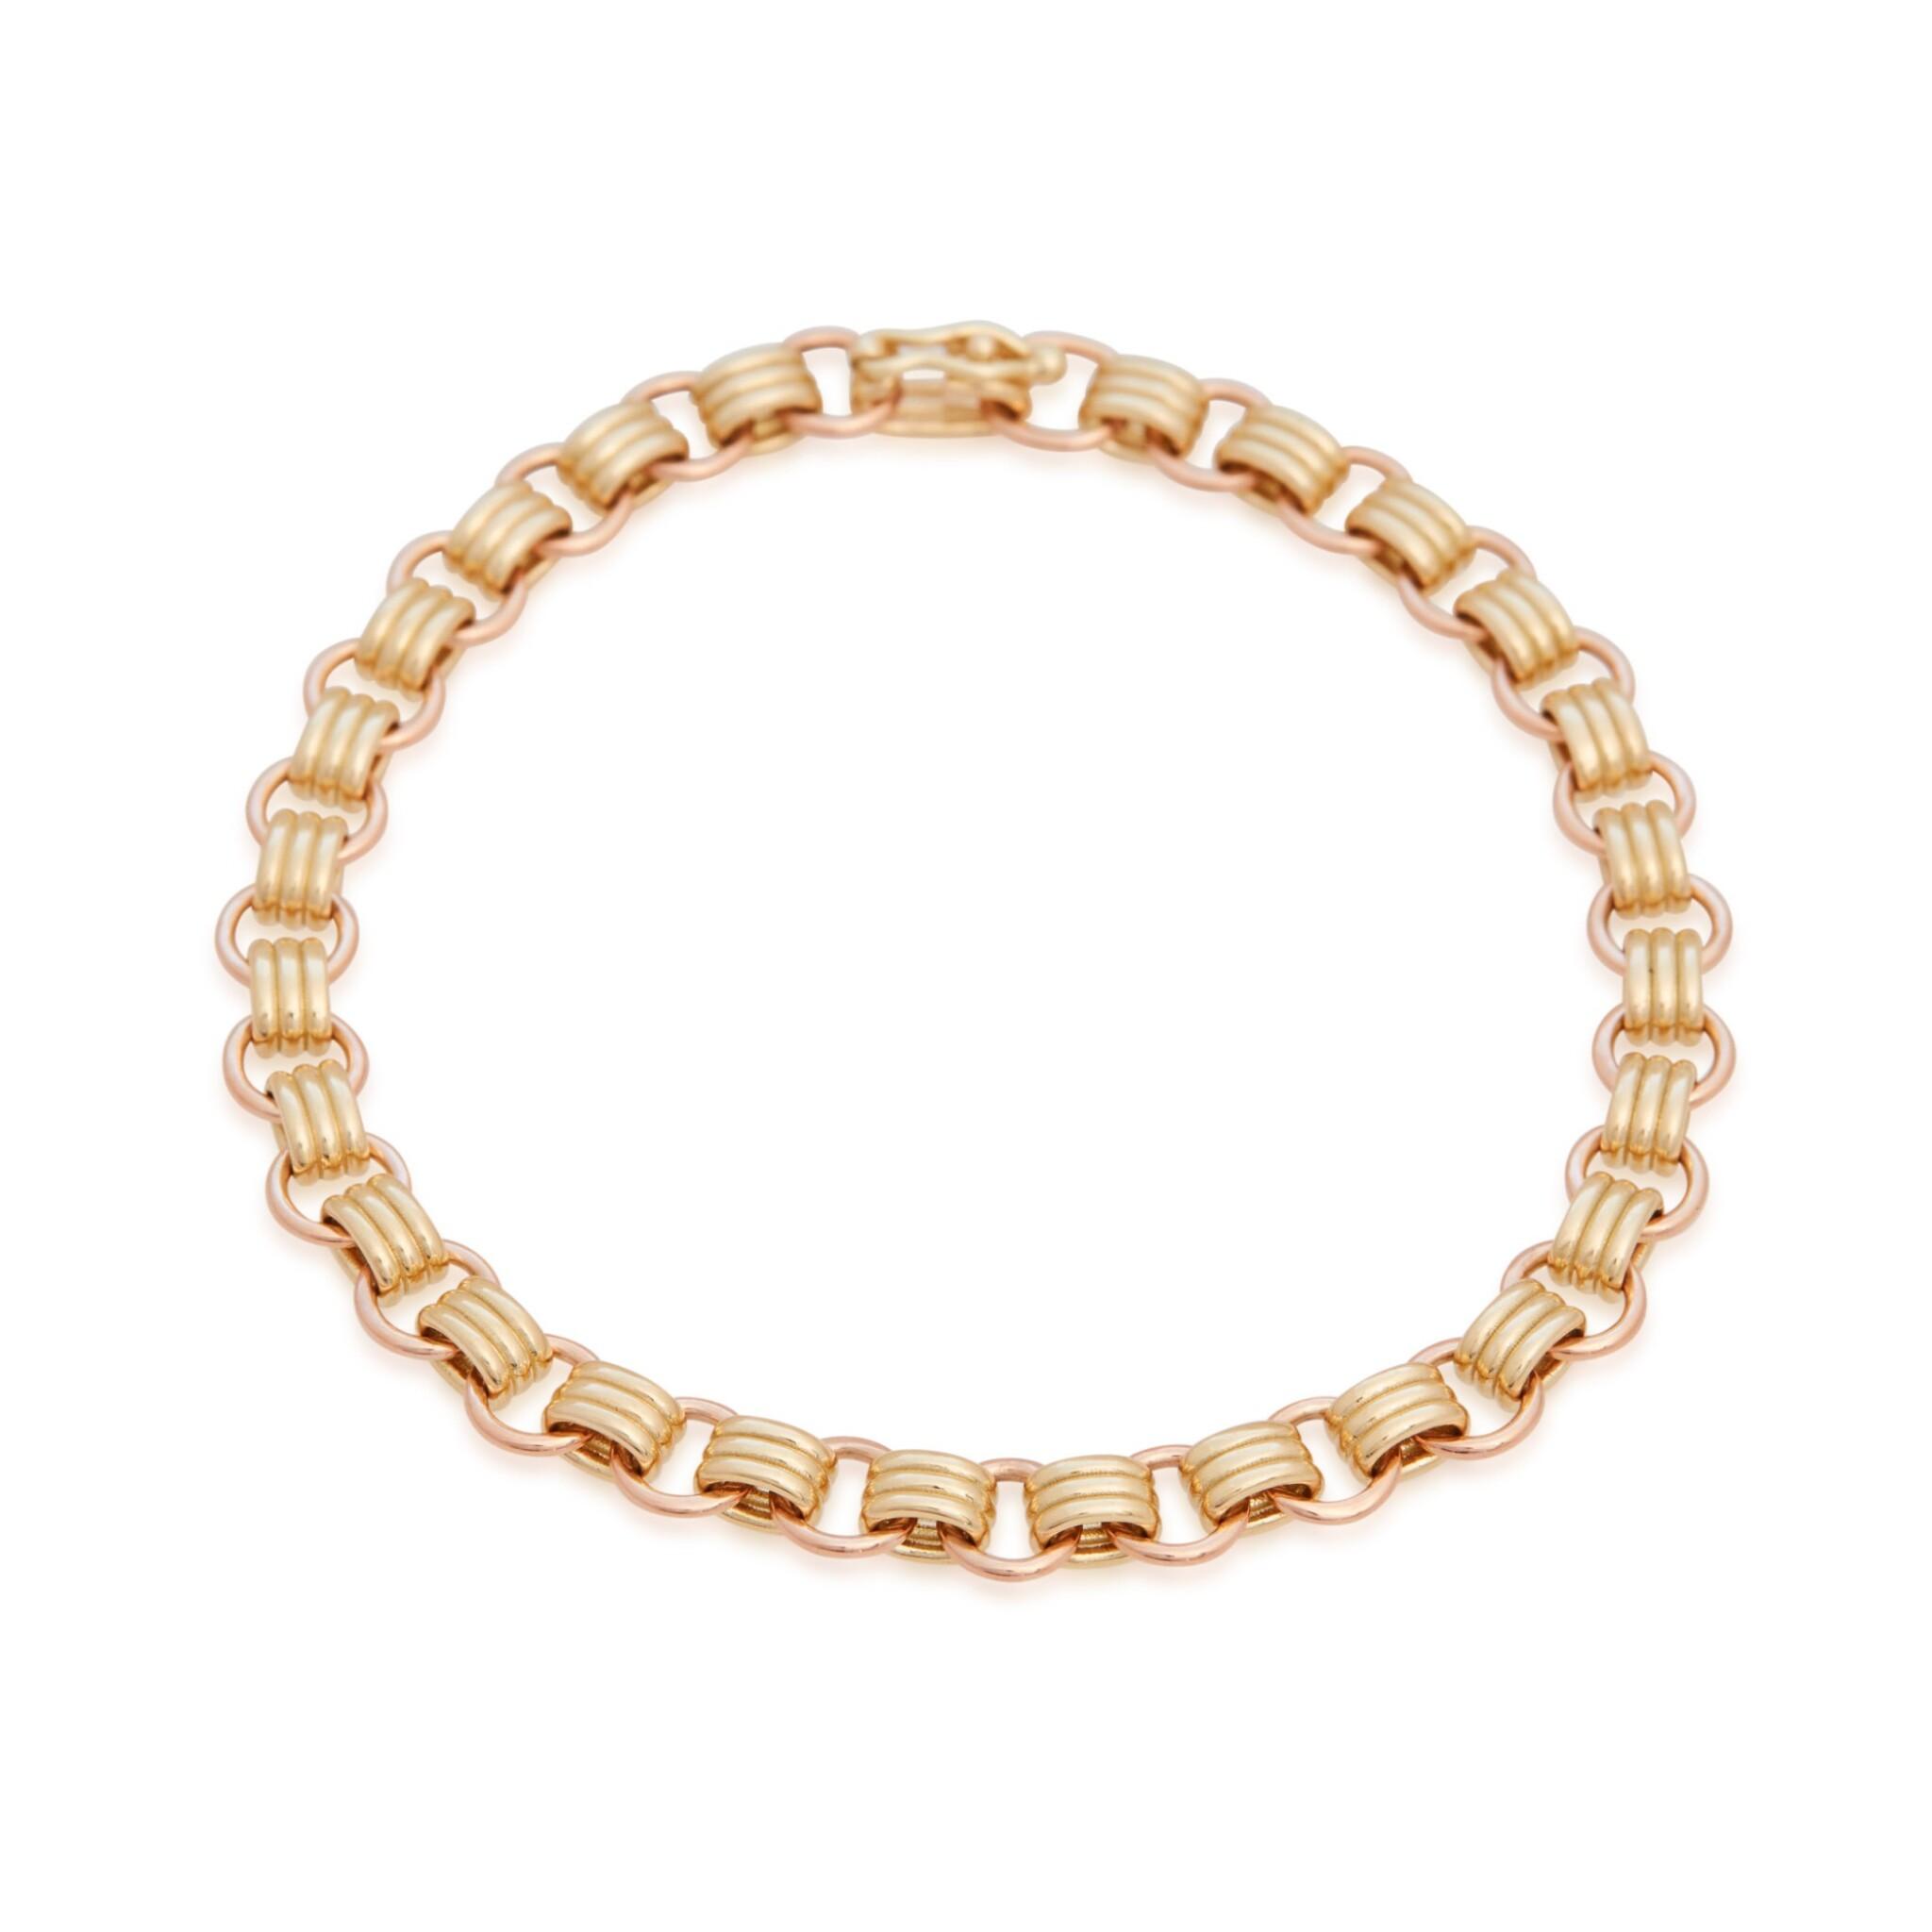 View full screen - View 1 of Lot 19. Sherman Field   18 Karat Yellow and Pink Gold Triple Chain Bracelet.